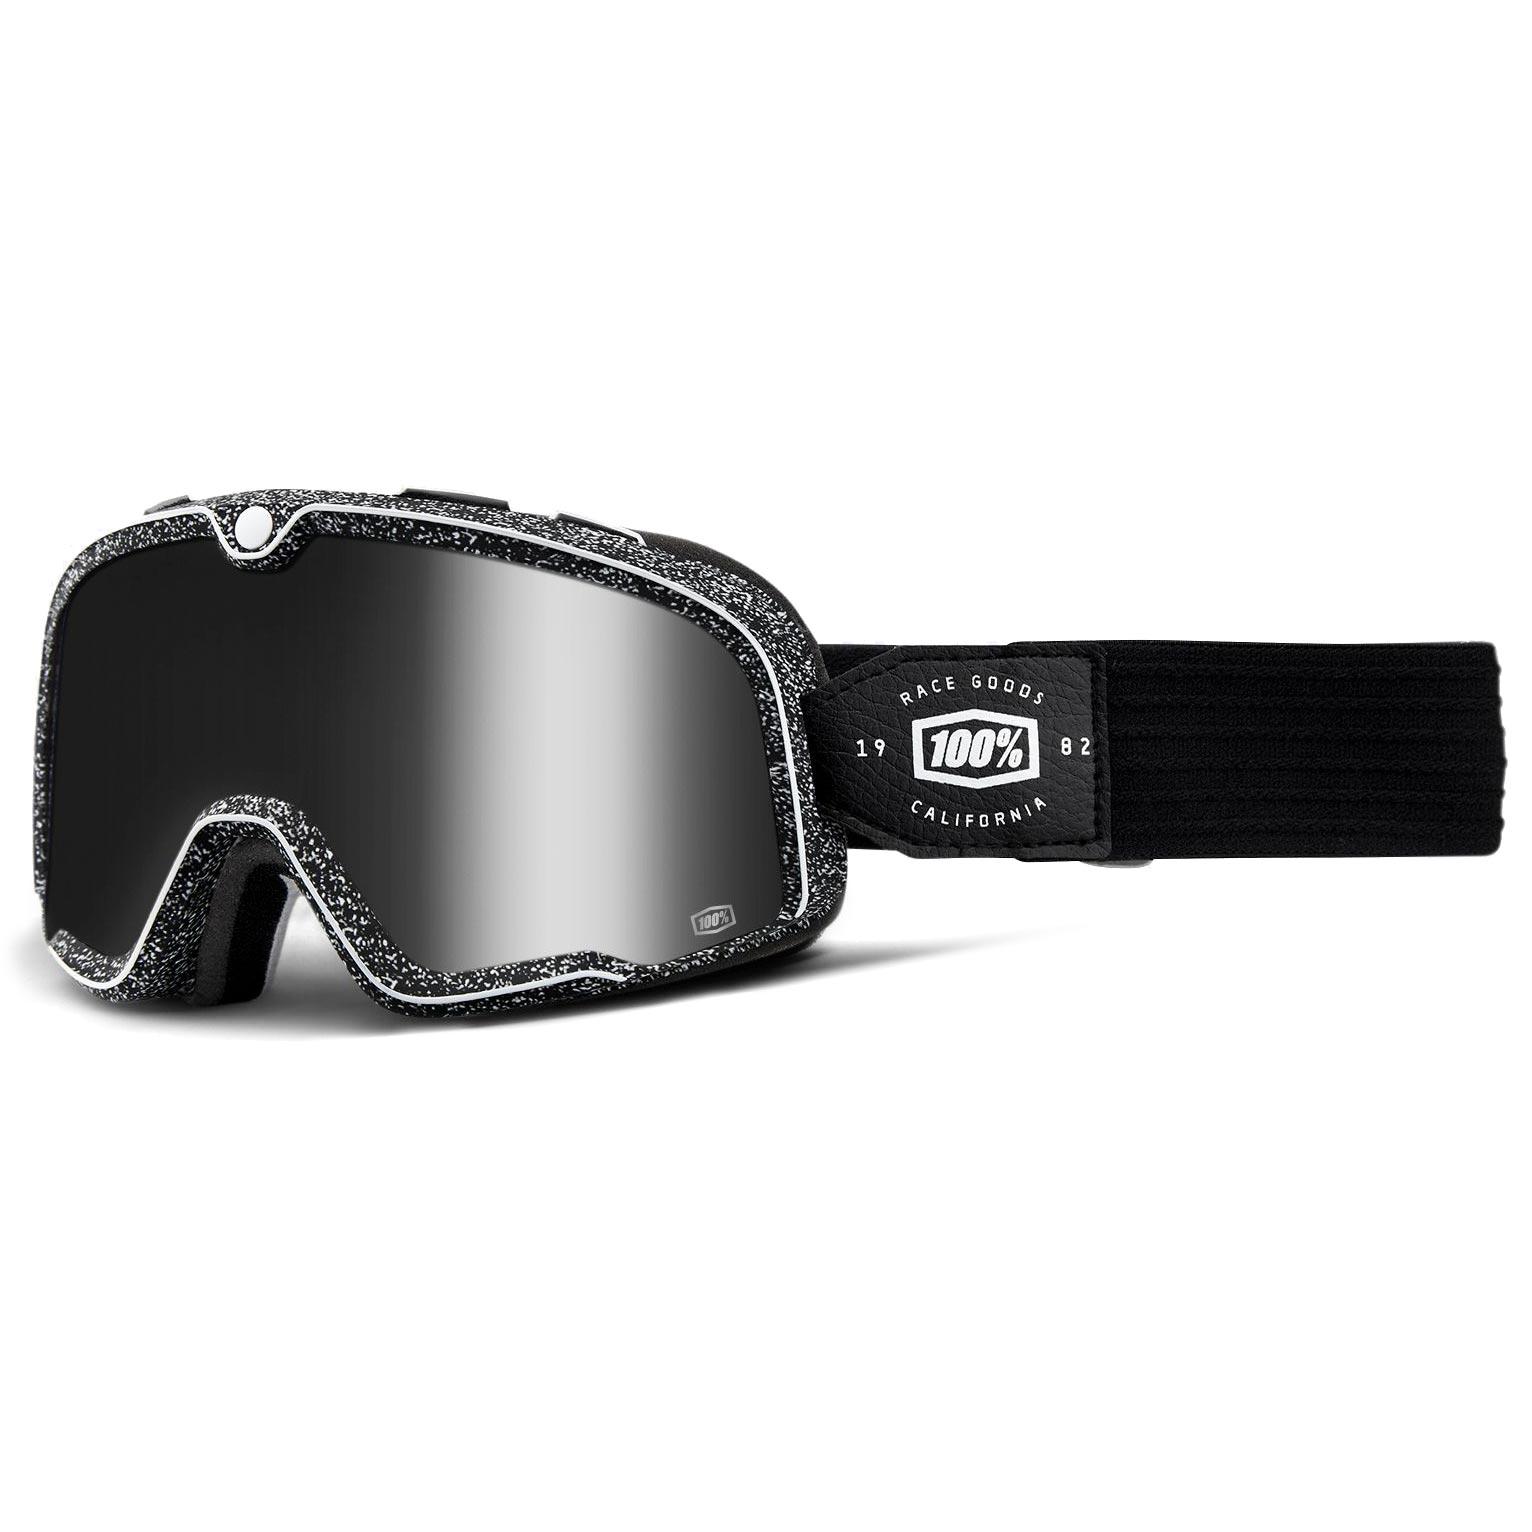 52f551032244da masque moto 100 barstow noise mirror silver lens noir harley davidson biker